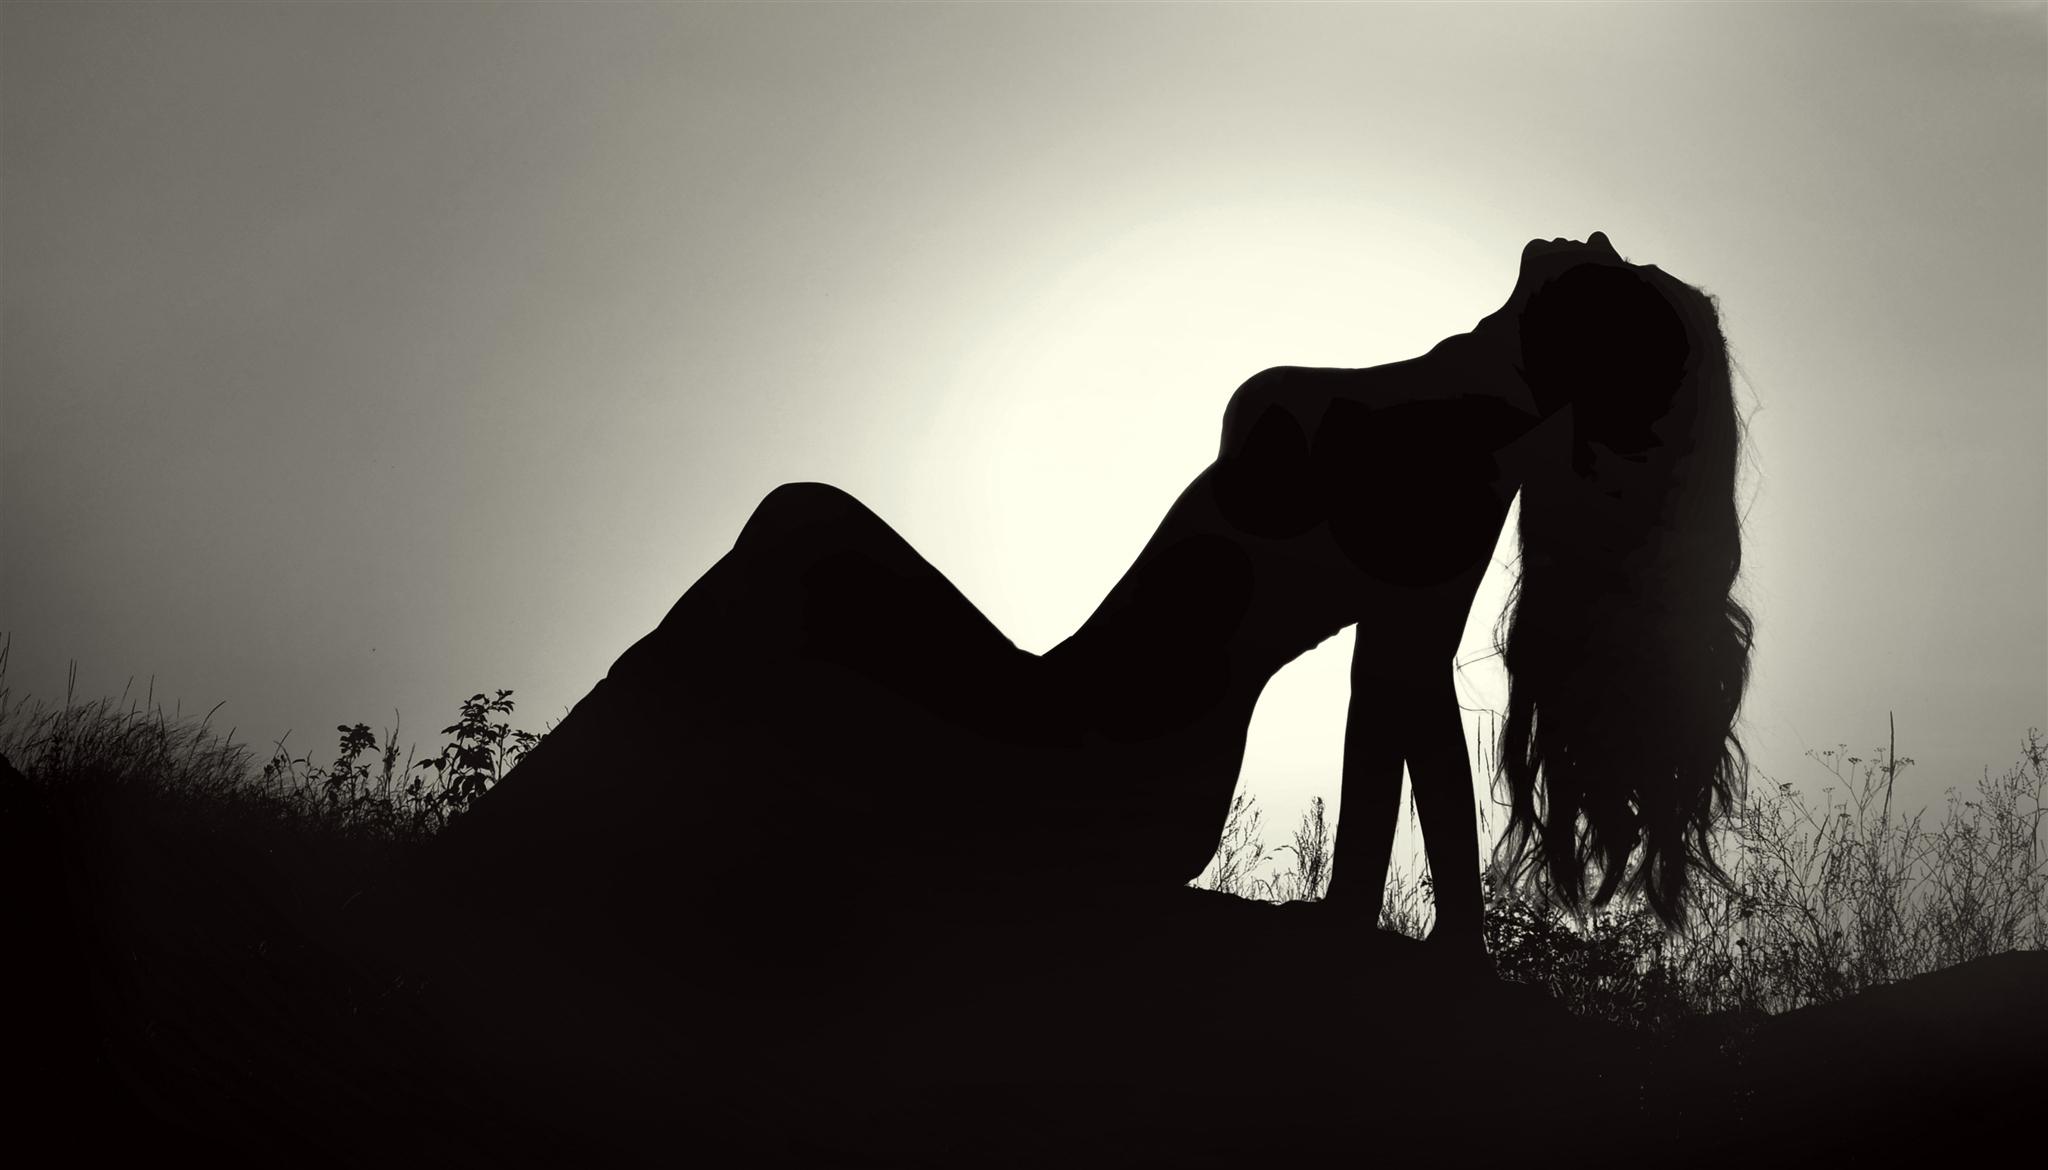 Картинки черно-белые девушки с тенью